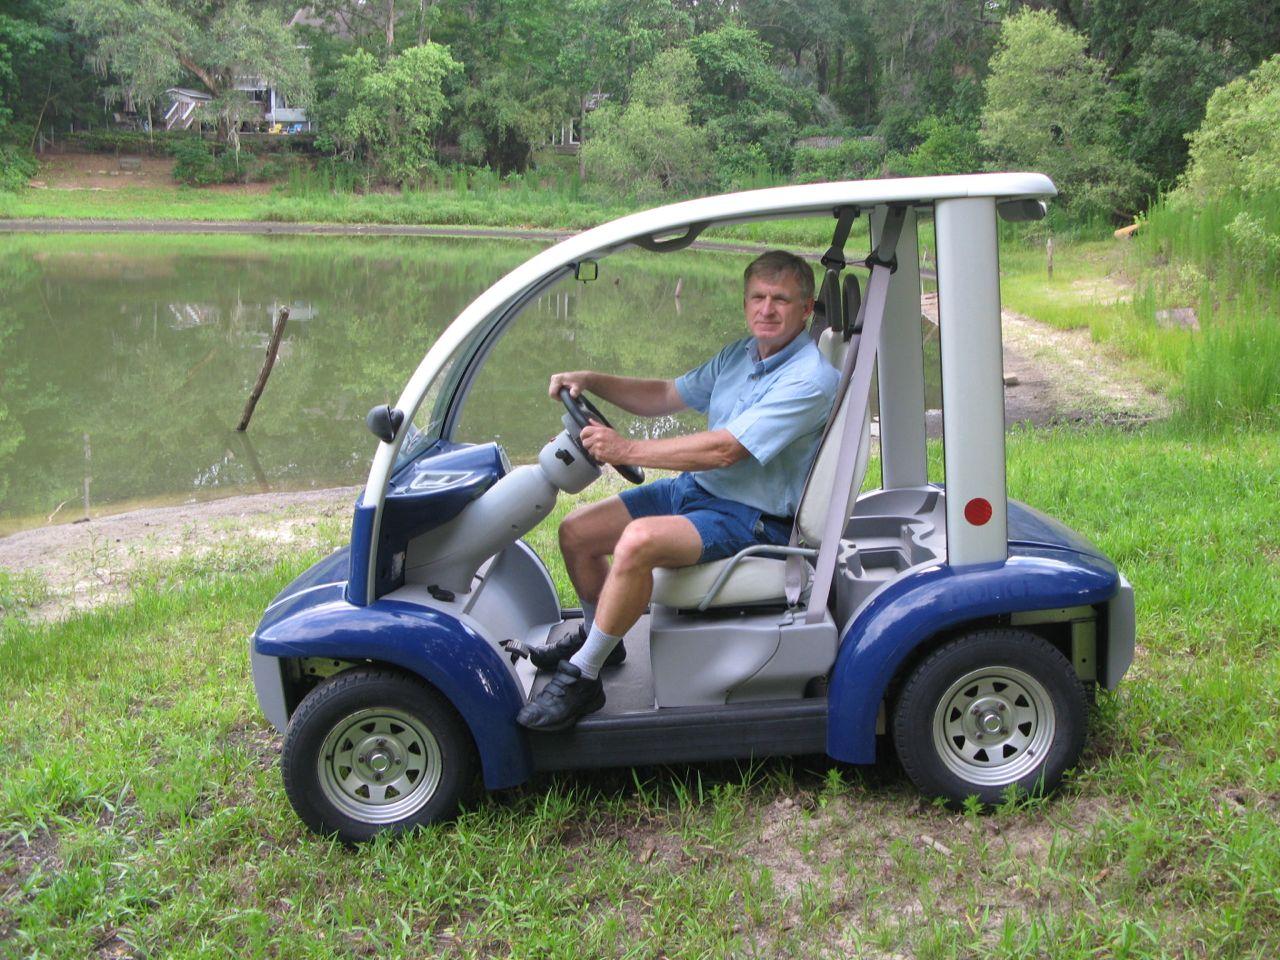 2002 Ford Think Neighbor Source · Florida Coal Cracker Chronicles My  Neighbor Down the Street Has a